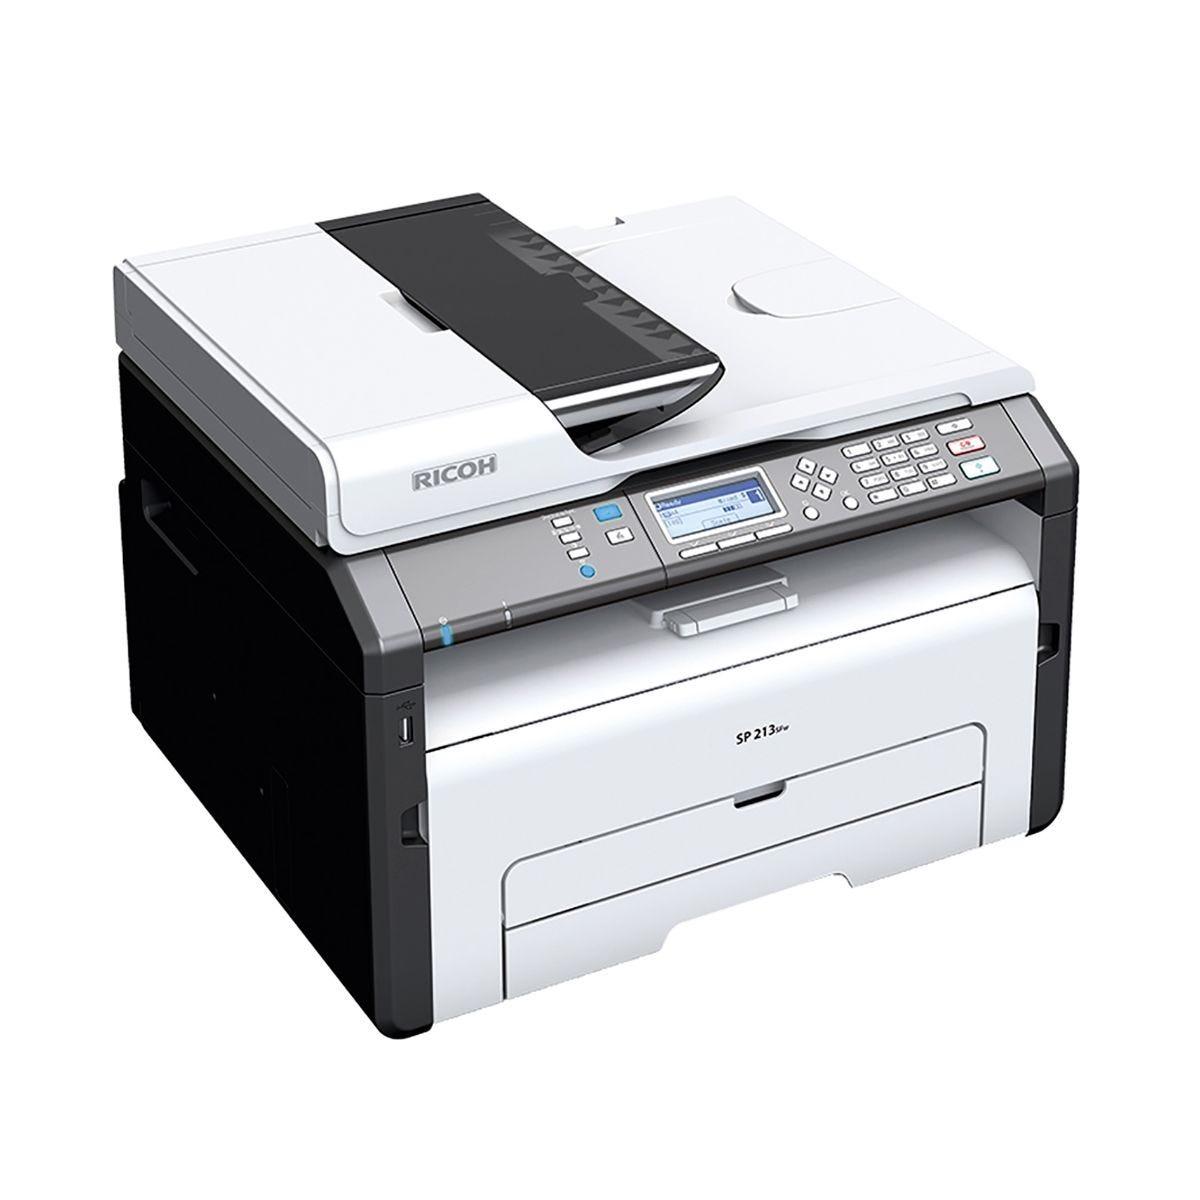 Co coloring book printer paper - Co Coloring Book Printer Paper 62